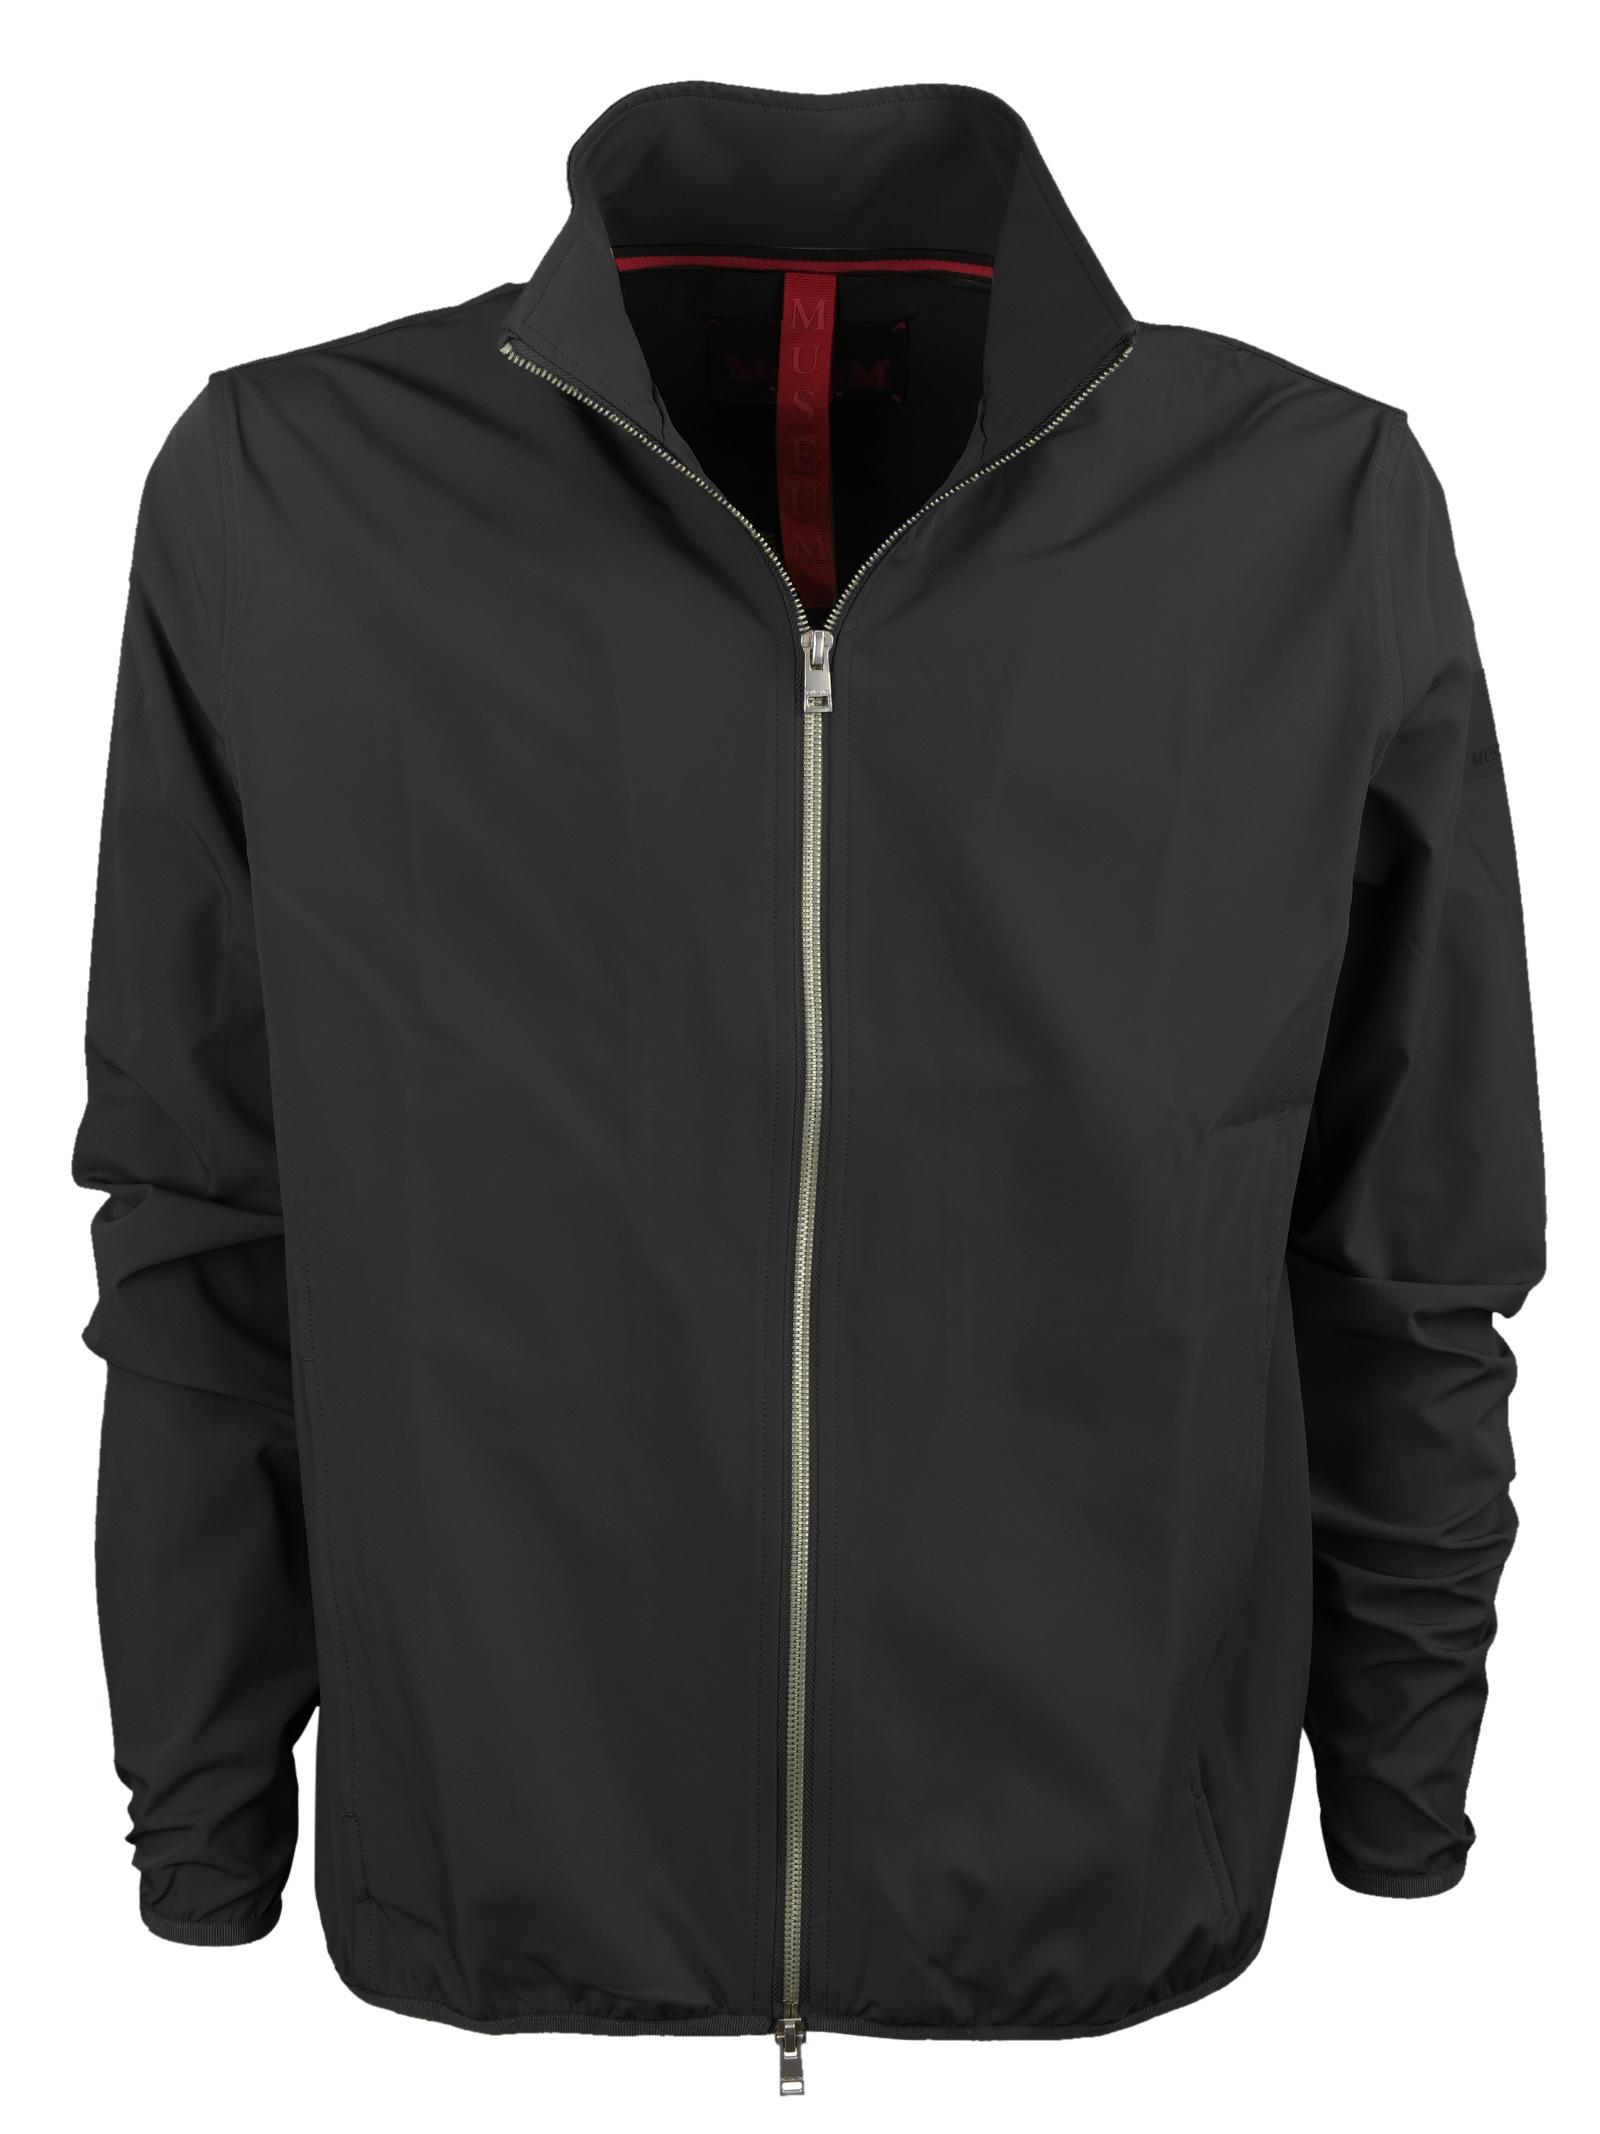 Stretch and light jacket MUSEUM | Jackets | TREVOR NY919C002